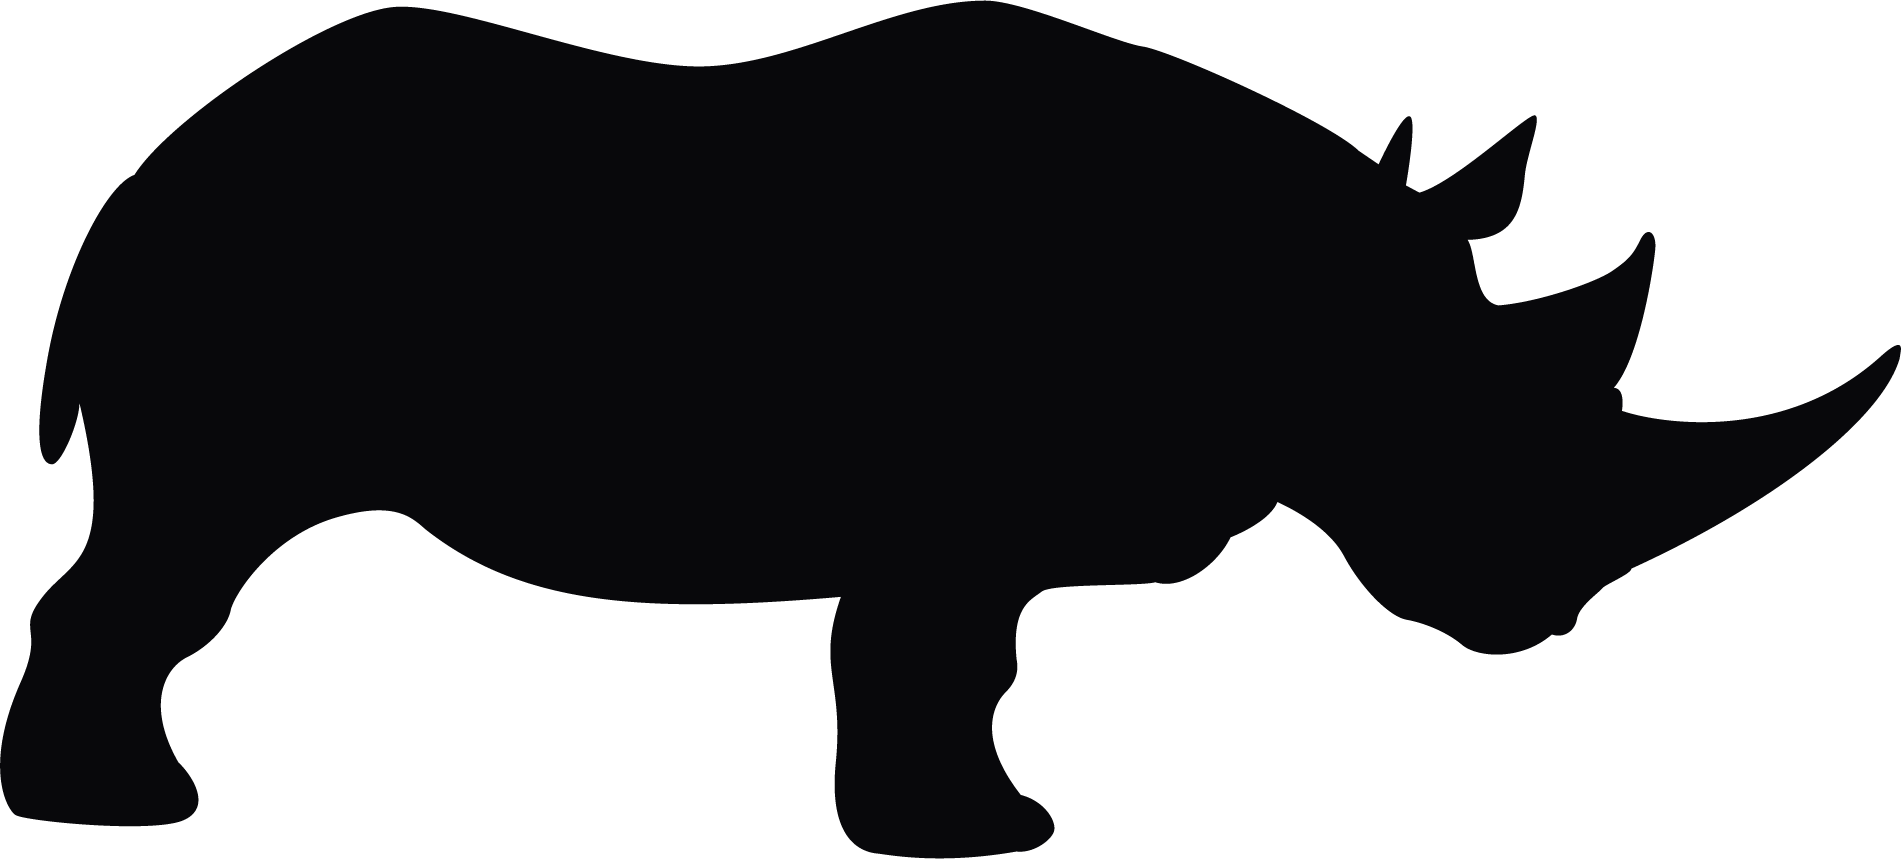 Mask clipart silhouette. Pics for rhino art